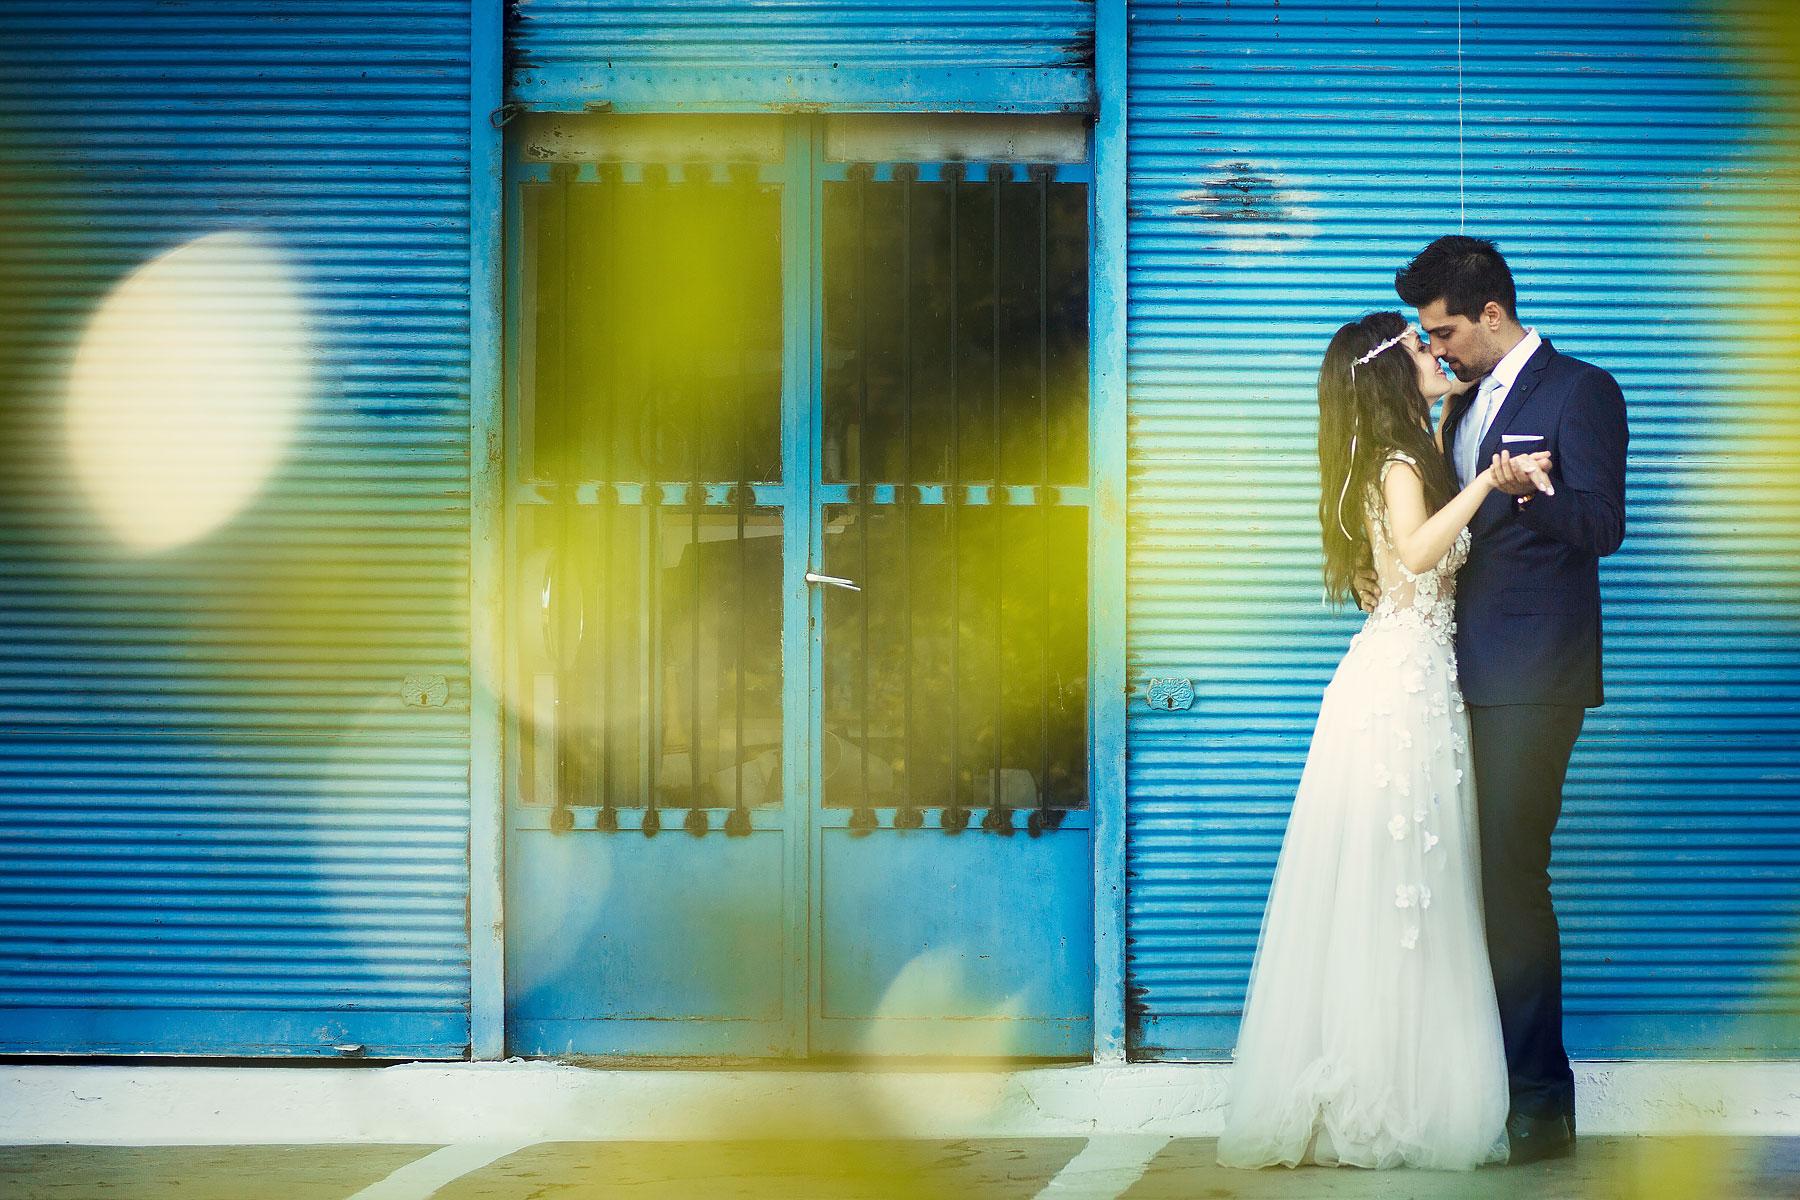 8e59P2Photography_wedding_Sotiris_Christina_2799-copy.jpg